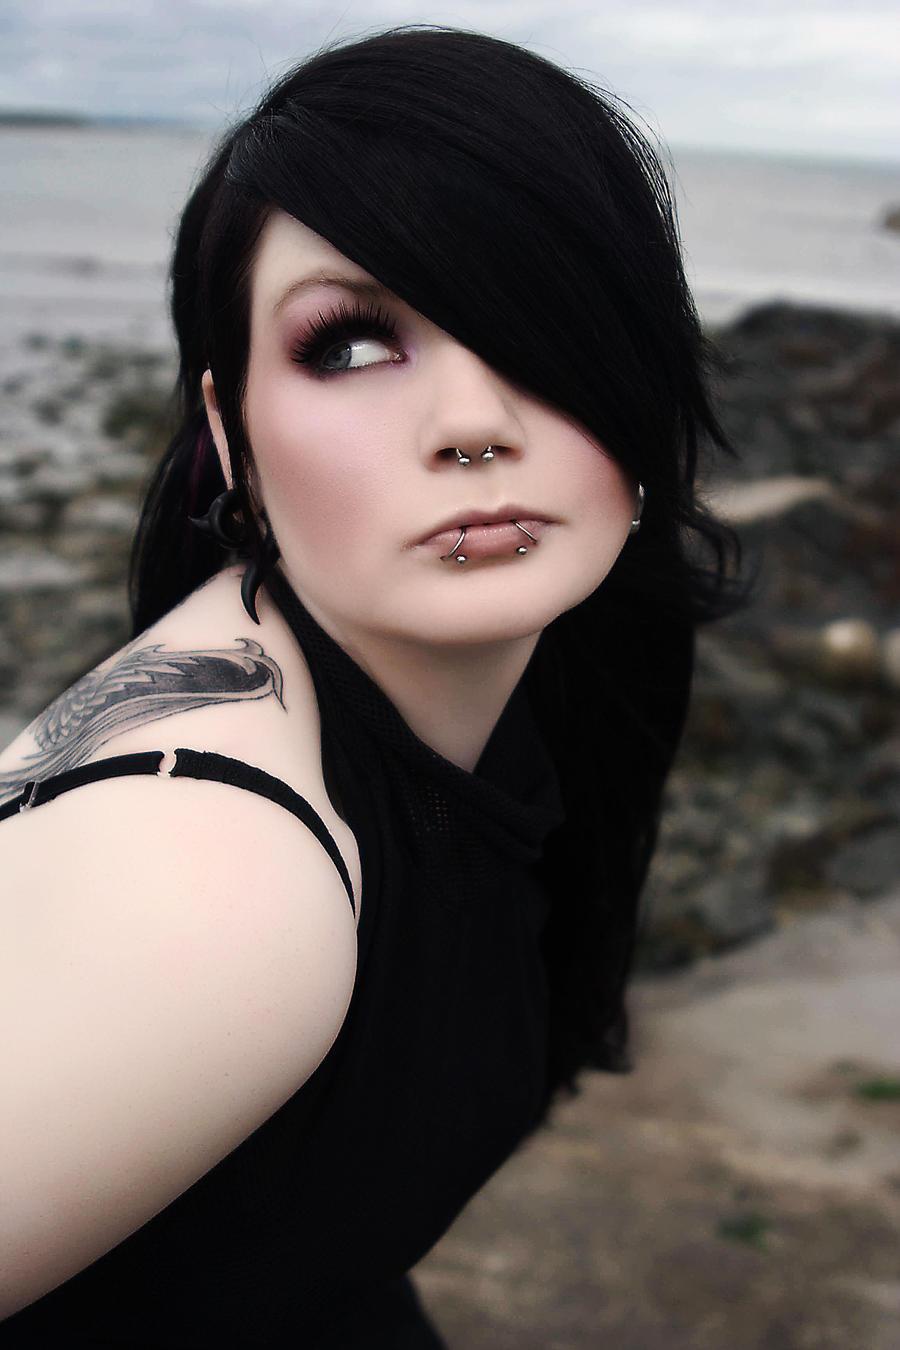 Dahlia-Dubh's Profile Picture